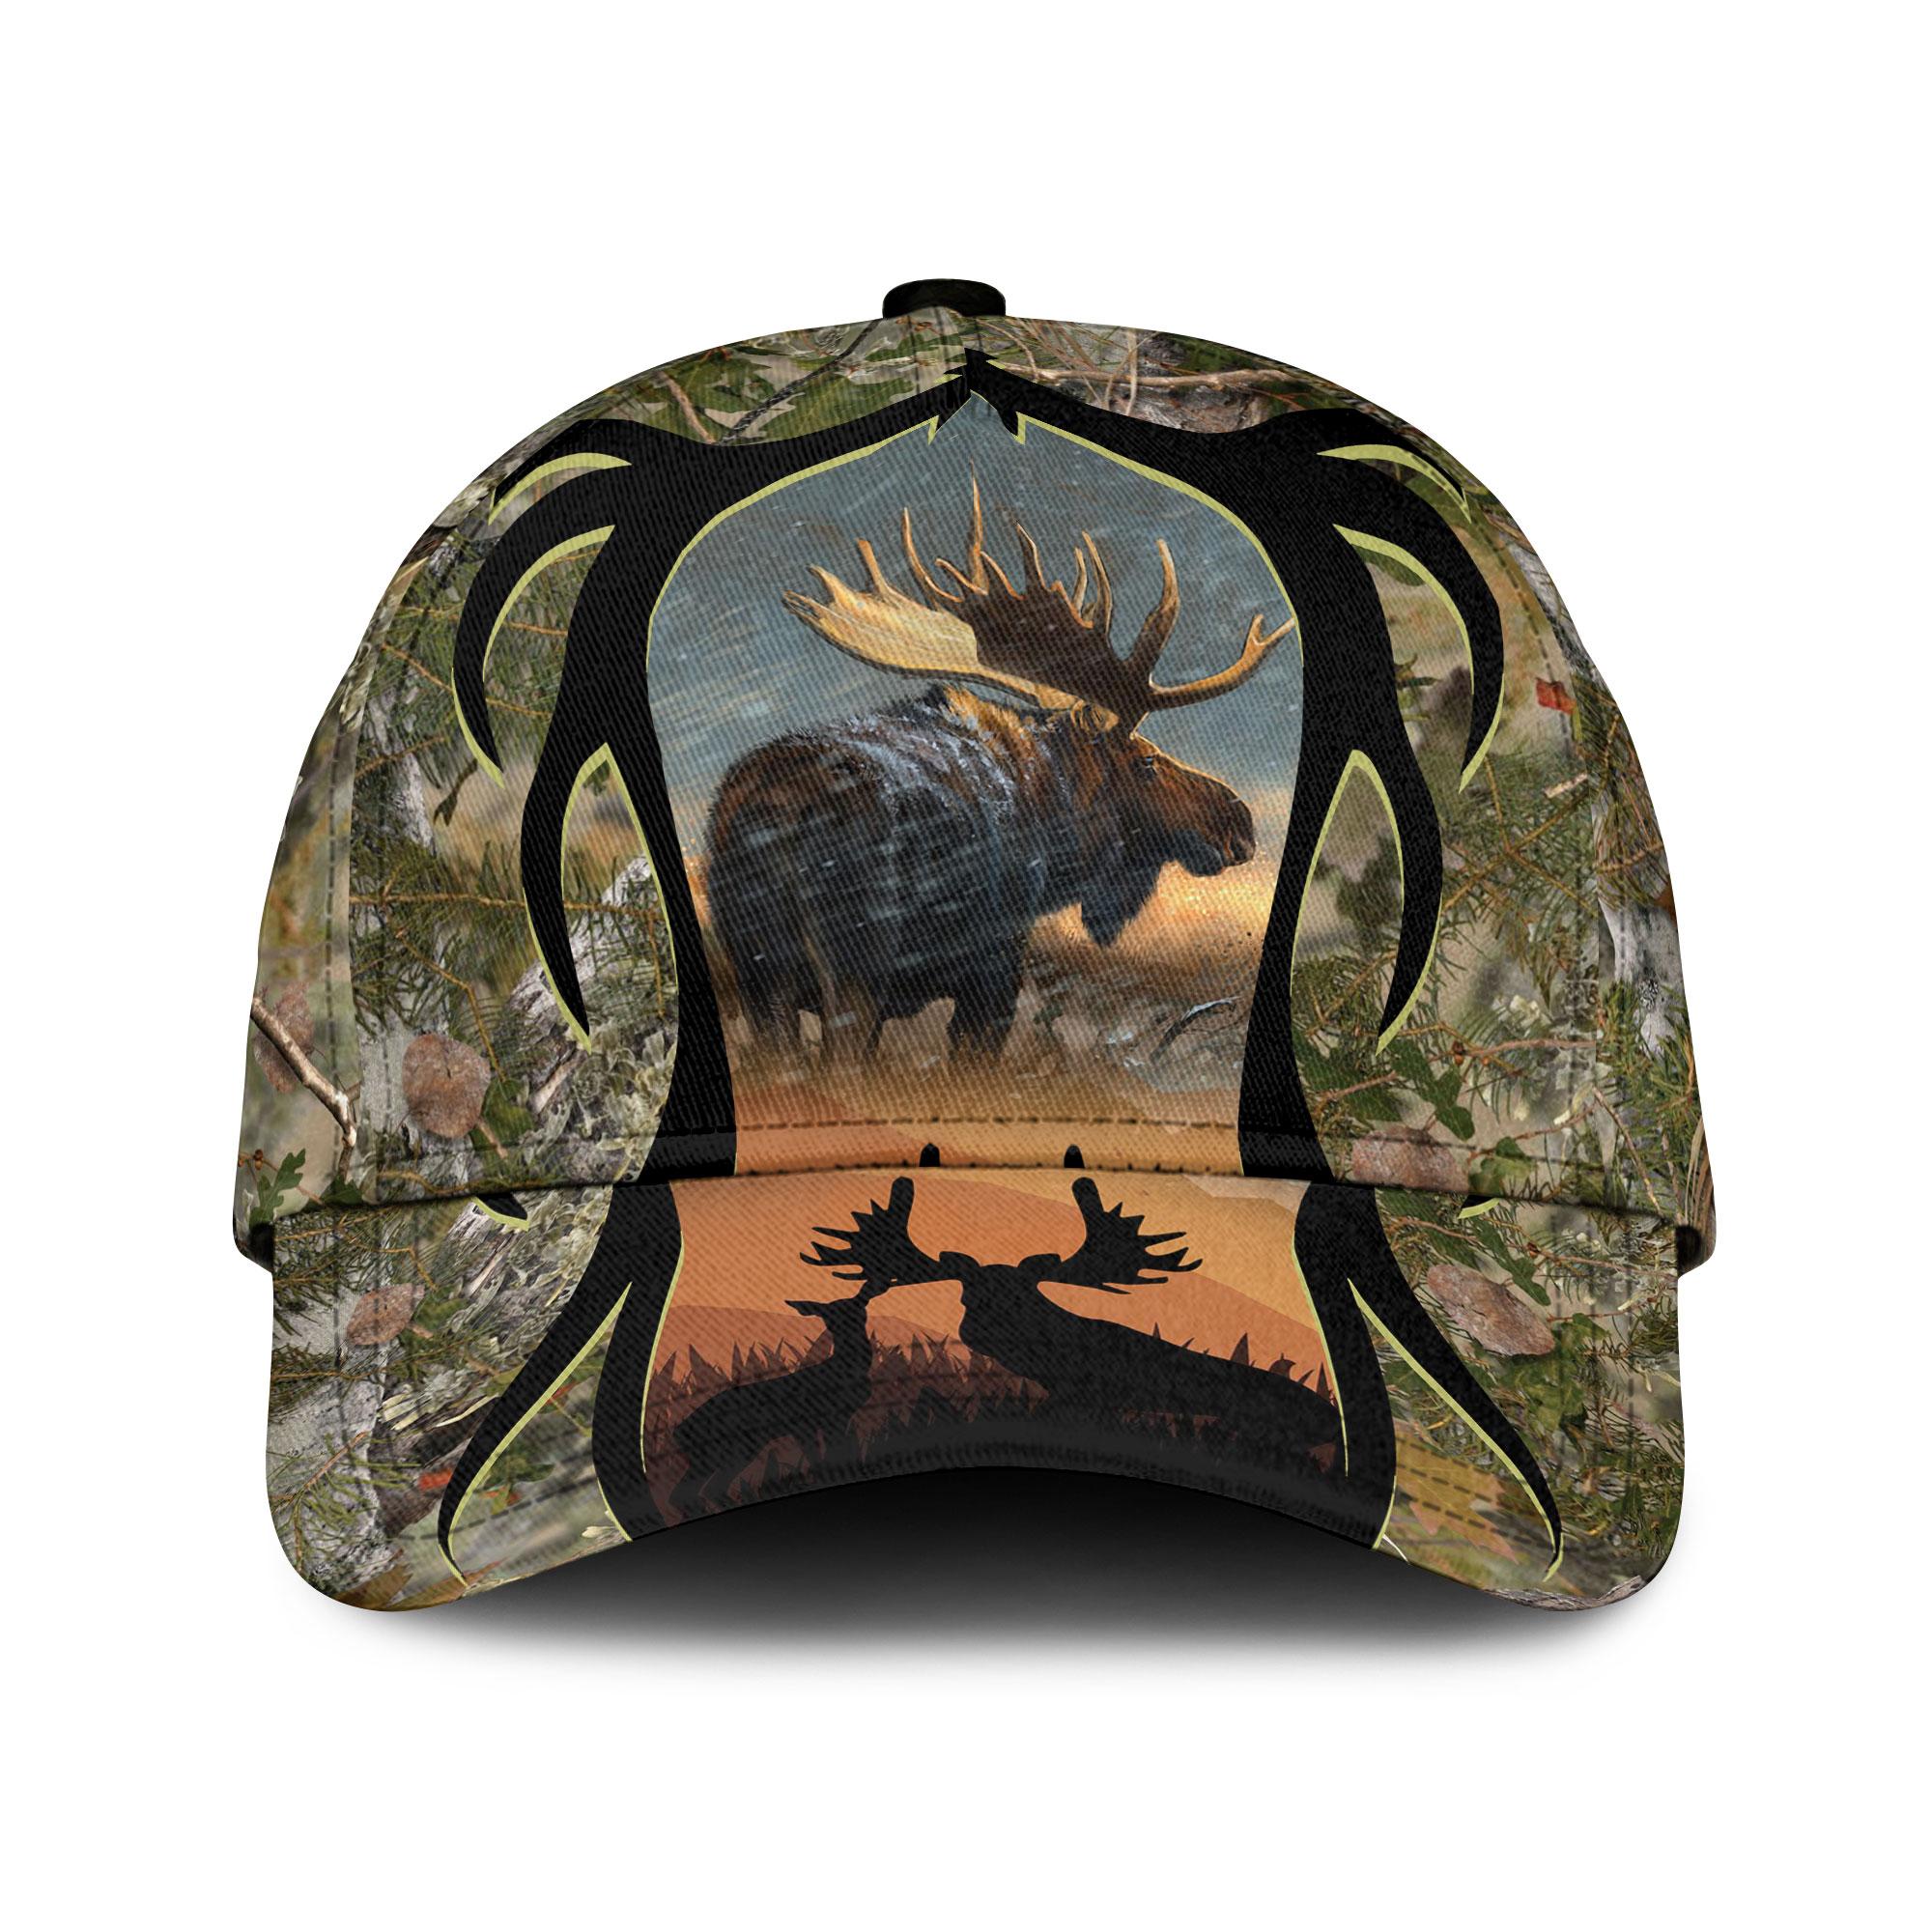 Love Moose Hunting Camouflage Sku 147 Classic Cap